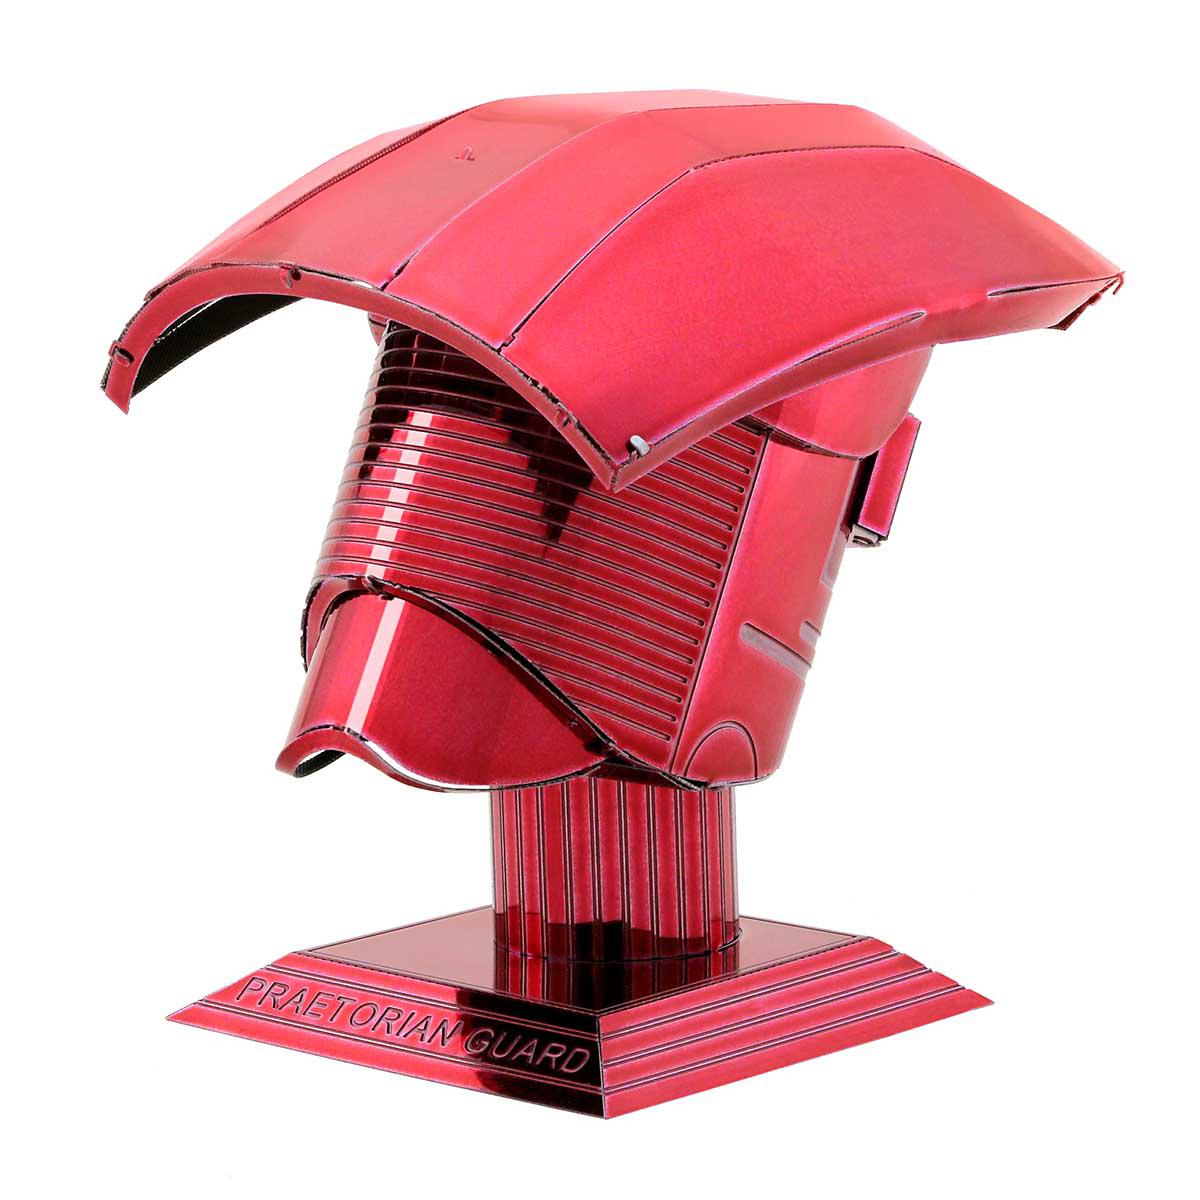 Praetorian Guard Helmet Movies / Books / TV Metal Puzzles